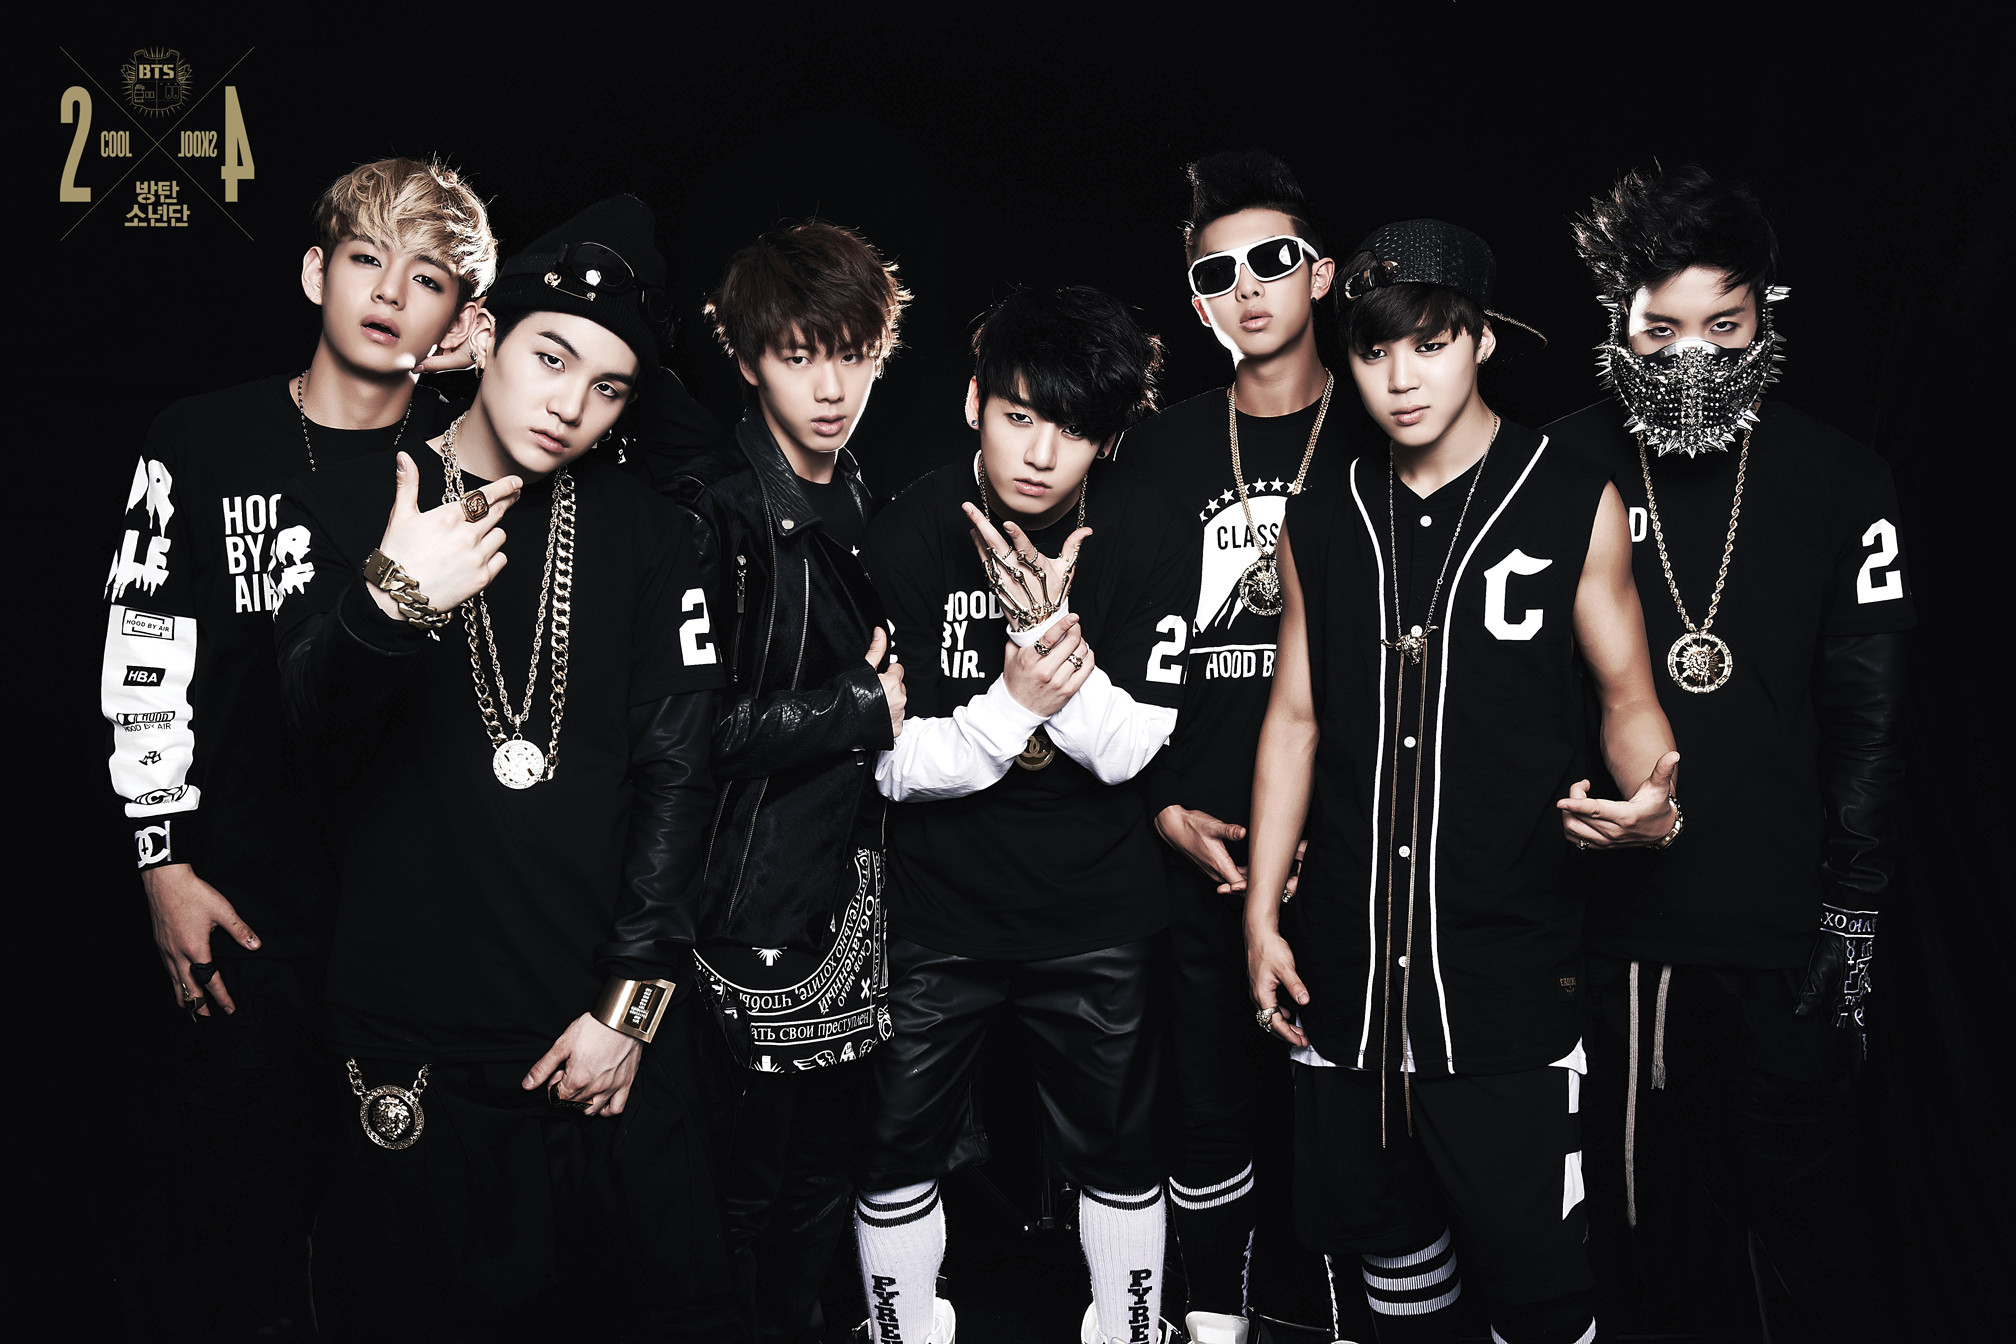 Queen_Tenshi images BTS-Bangtan Boys HD wallpaper and background photos